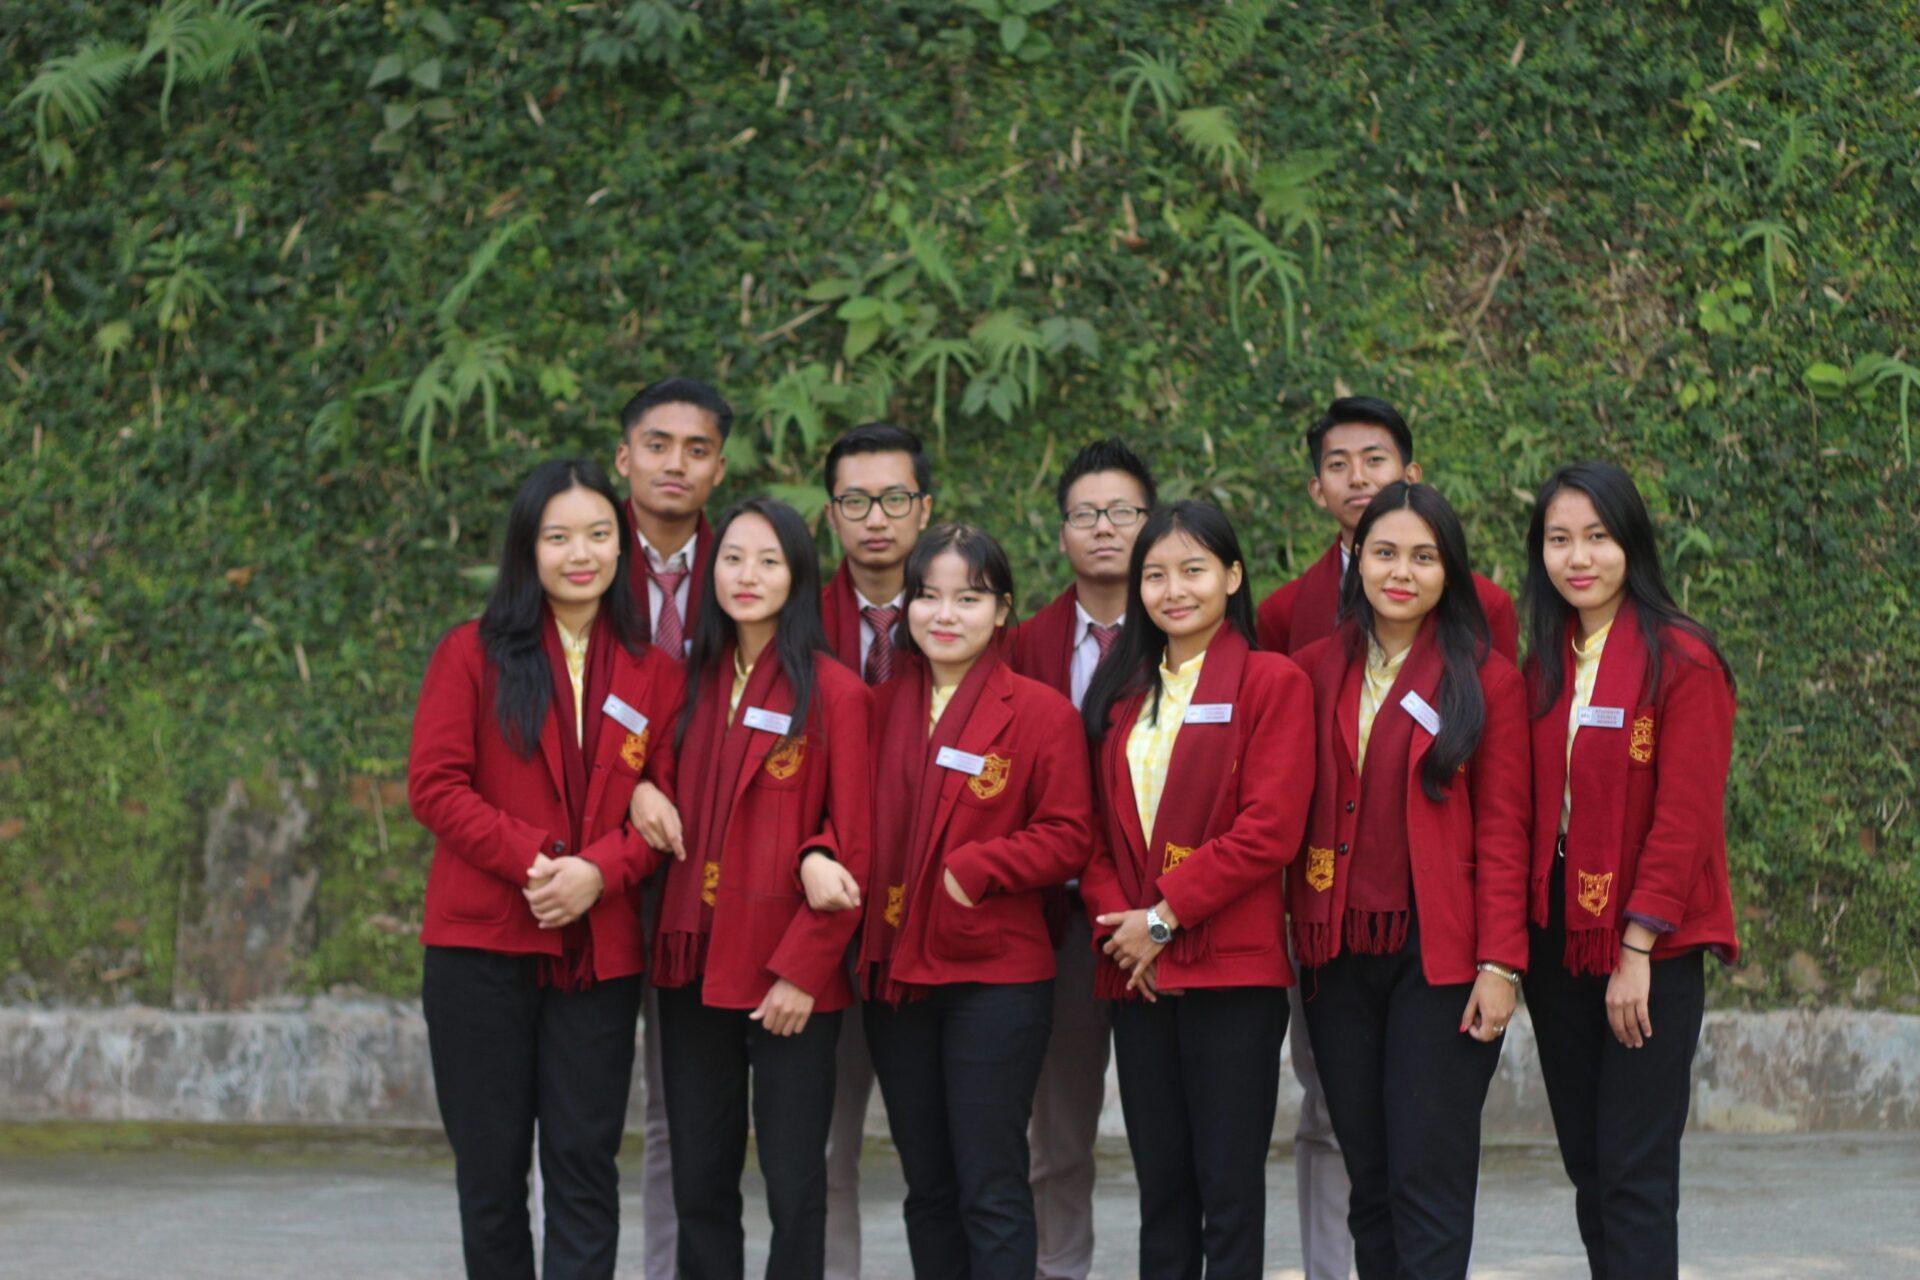 Std council